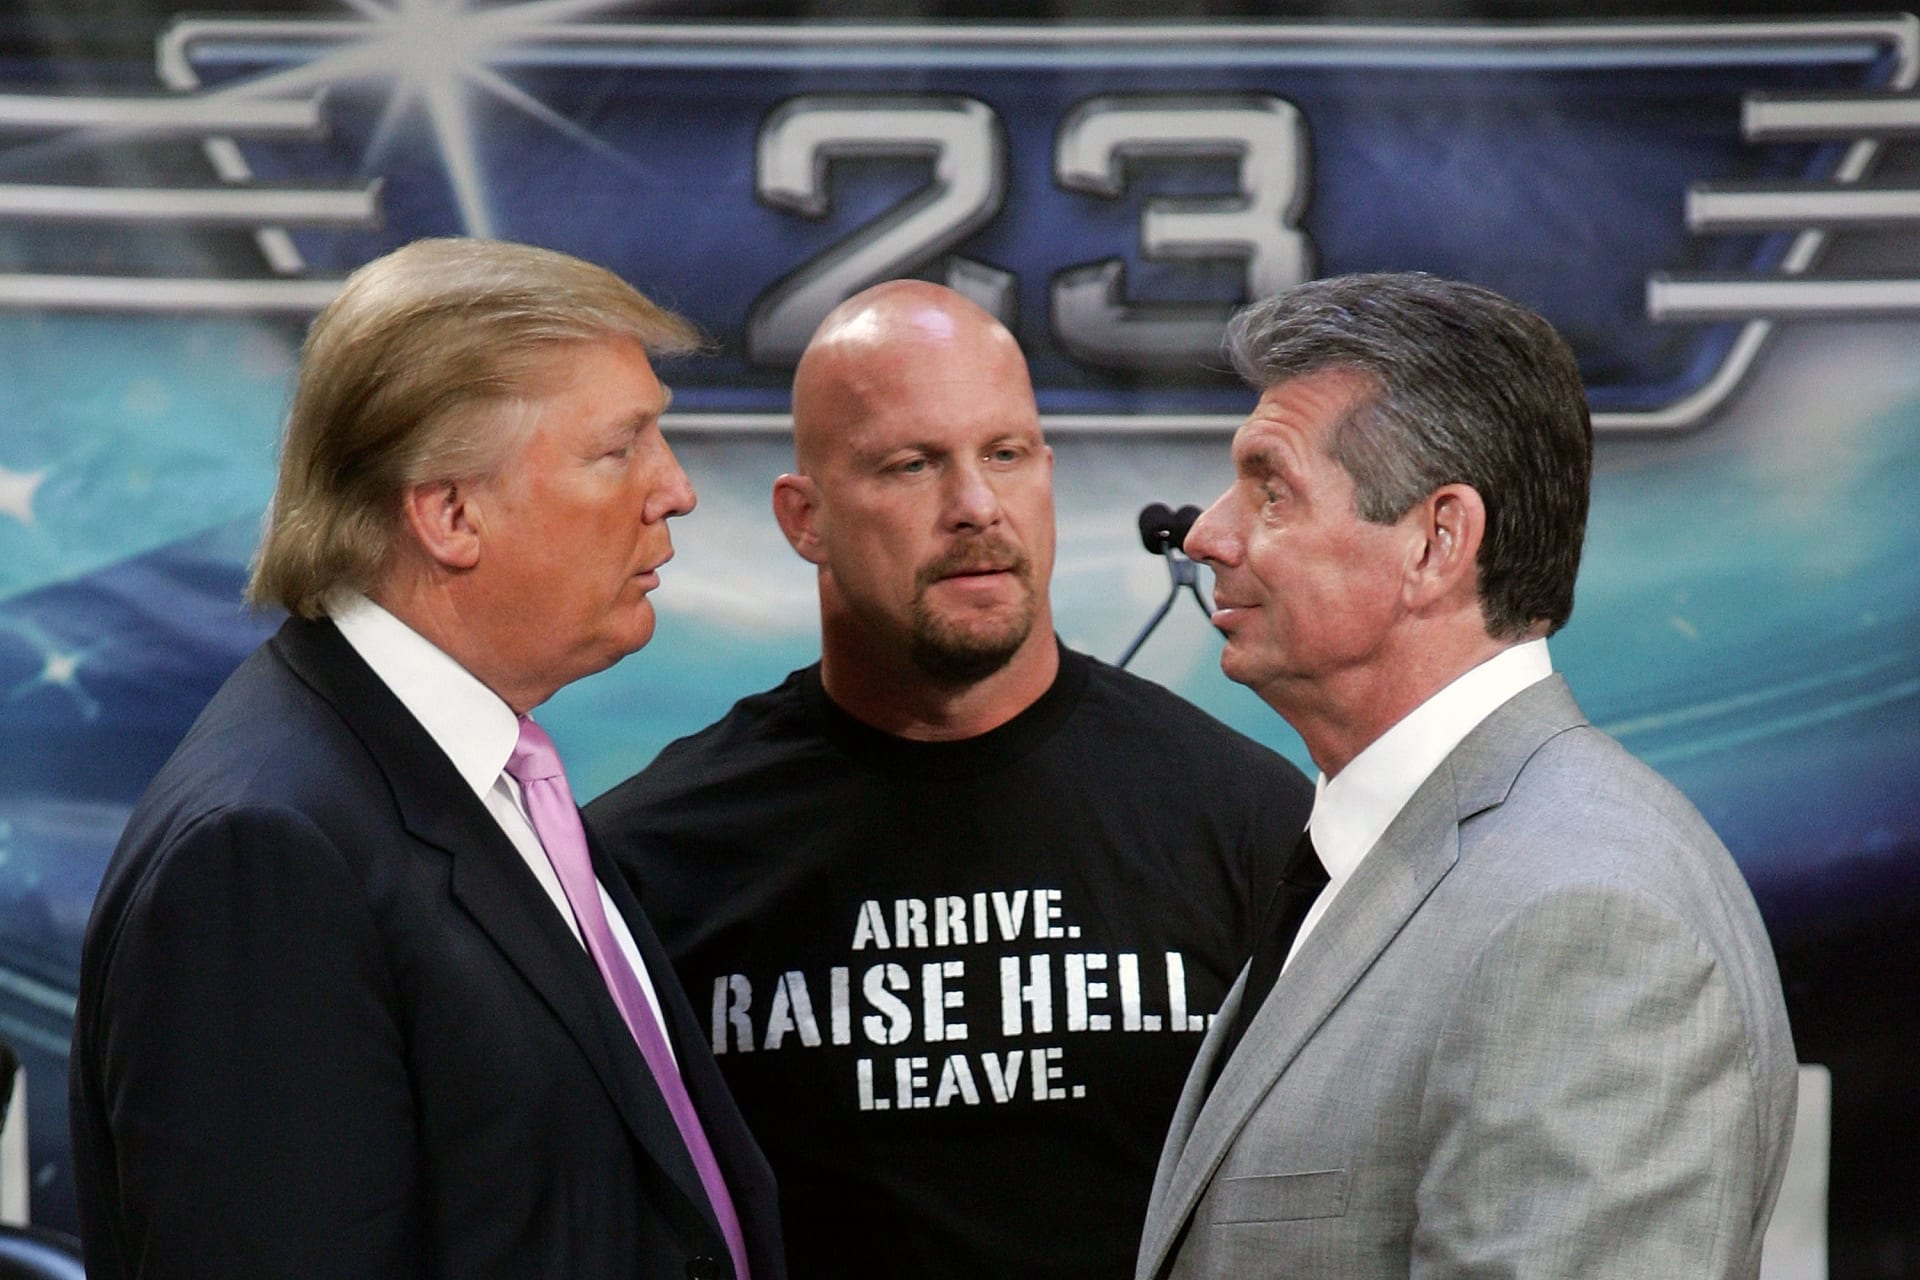 Stone Cold Steve Austin Donald Trump Vince McMahon WrestleMania 23